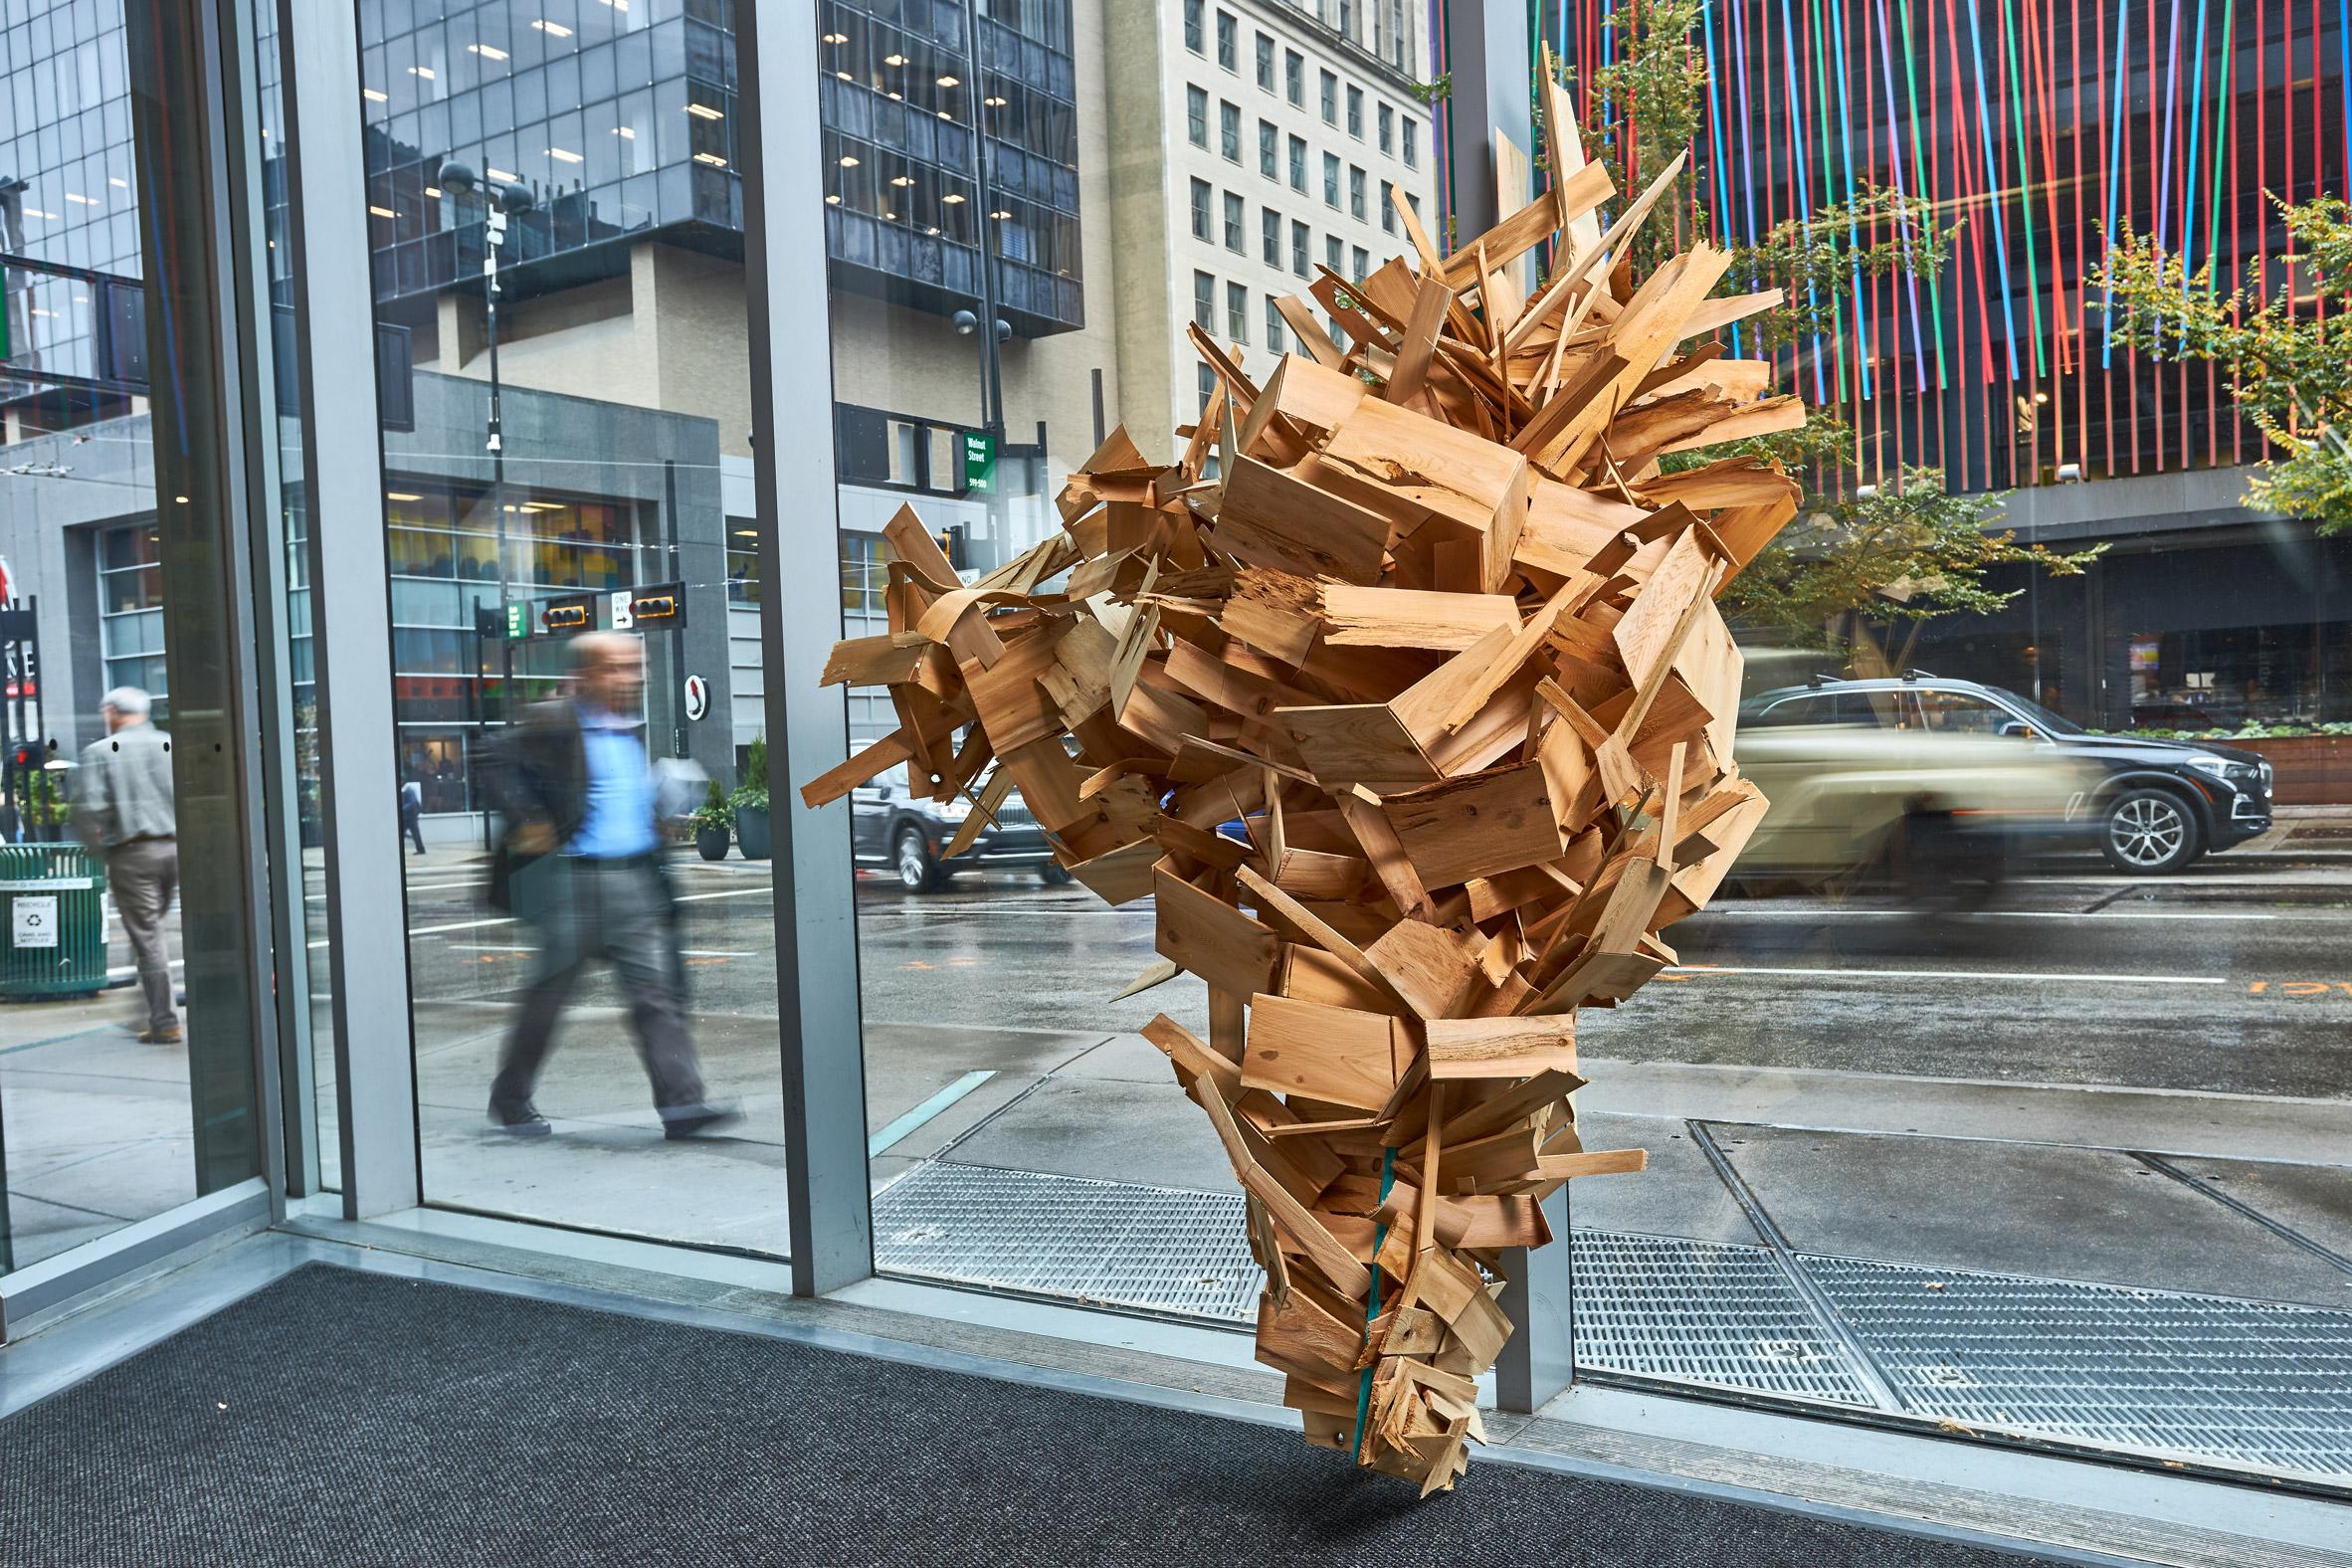 Props Exhibition at Zaha Hadid Contemporary Arts Centre